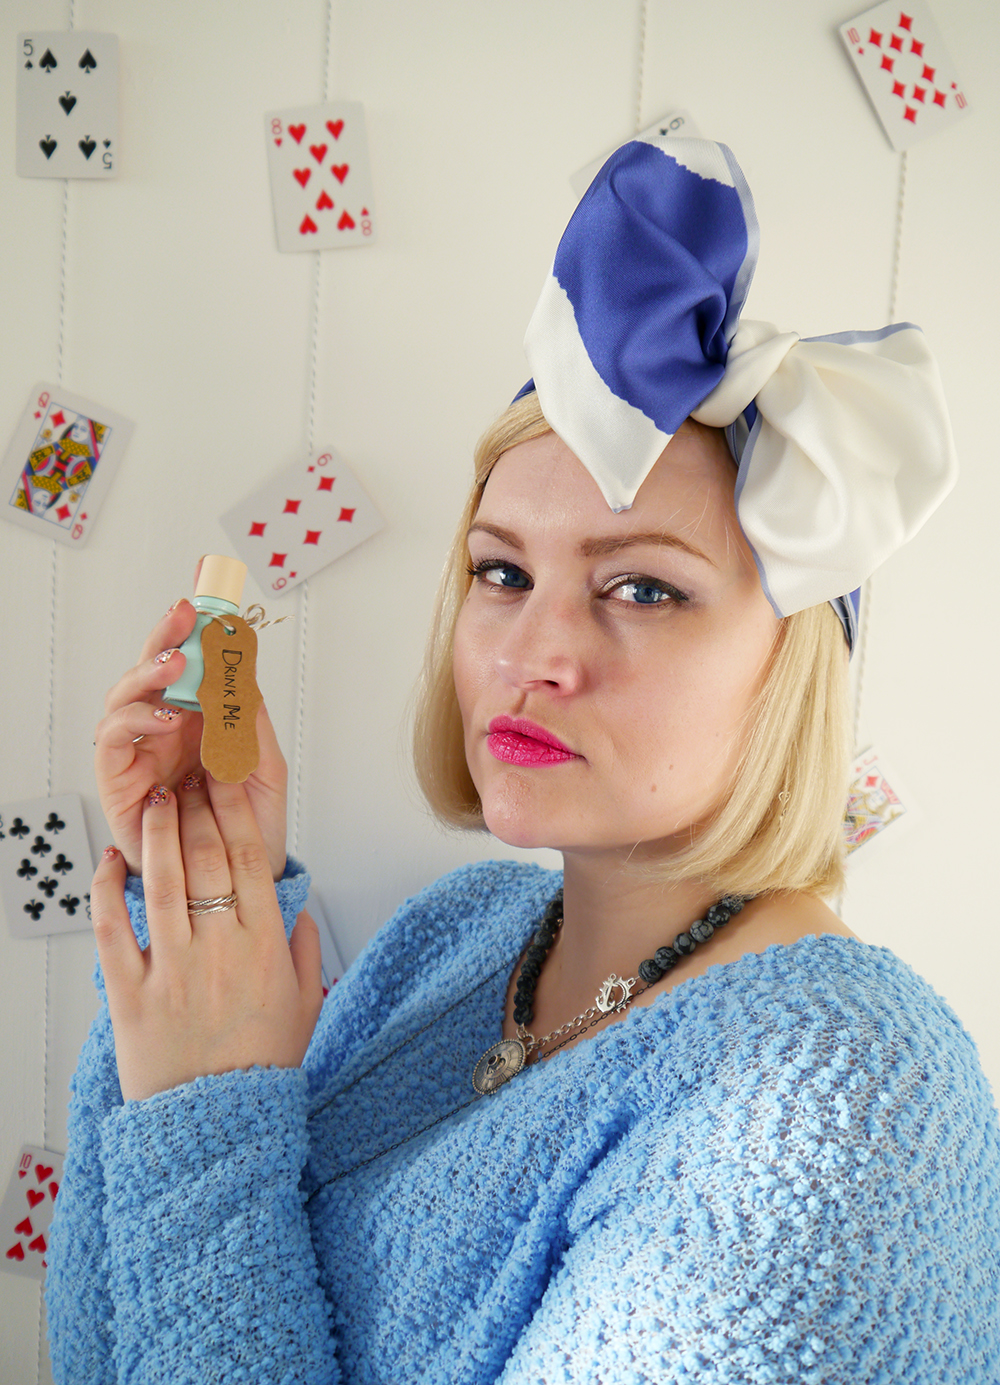 Alice in Wonderland, Karen Smith Jewellery, drink me, style inspiration, how to tie a hair bow, Cleo Ferin Mercury panda scarf, Scottish blogger, steampunk